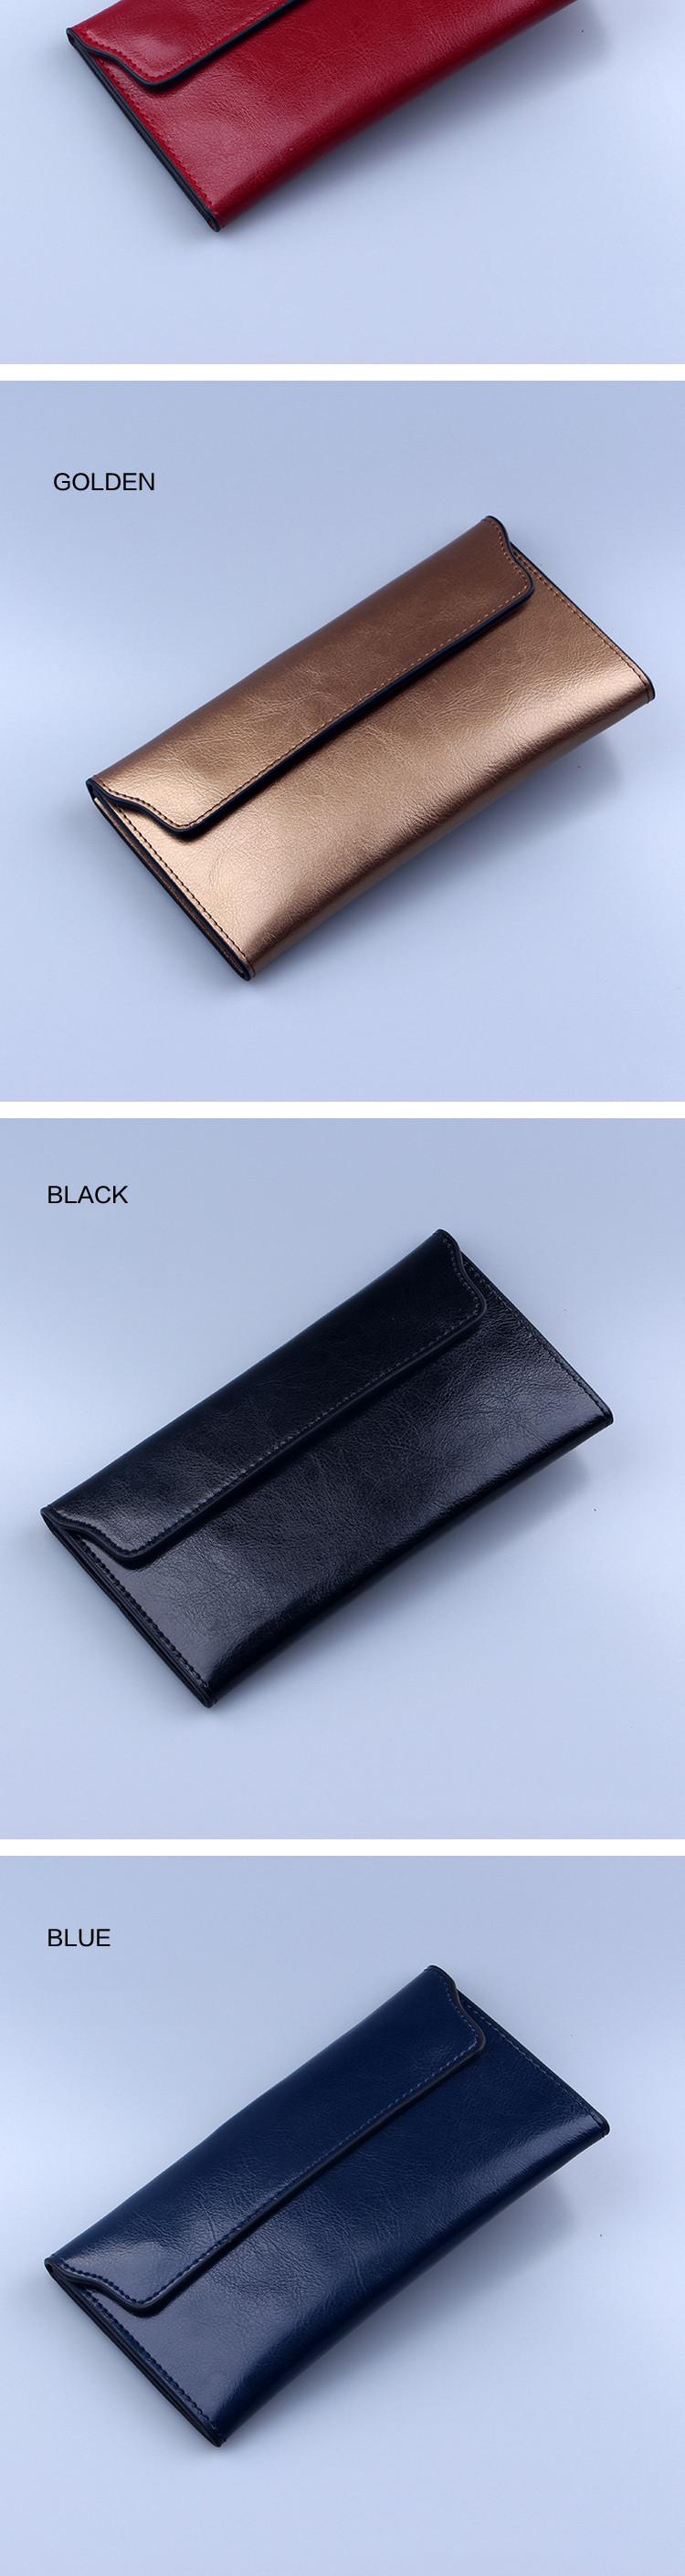 women-handbag01_05